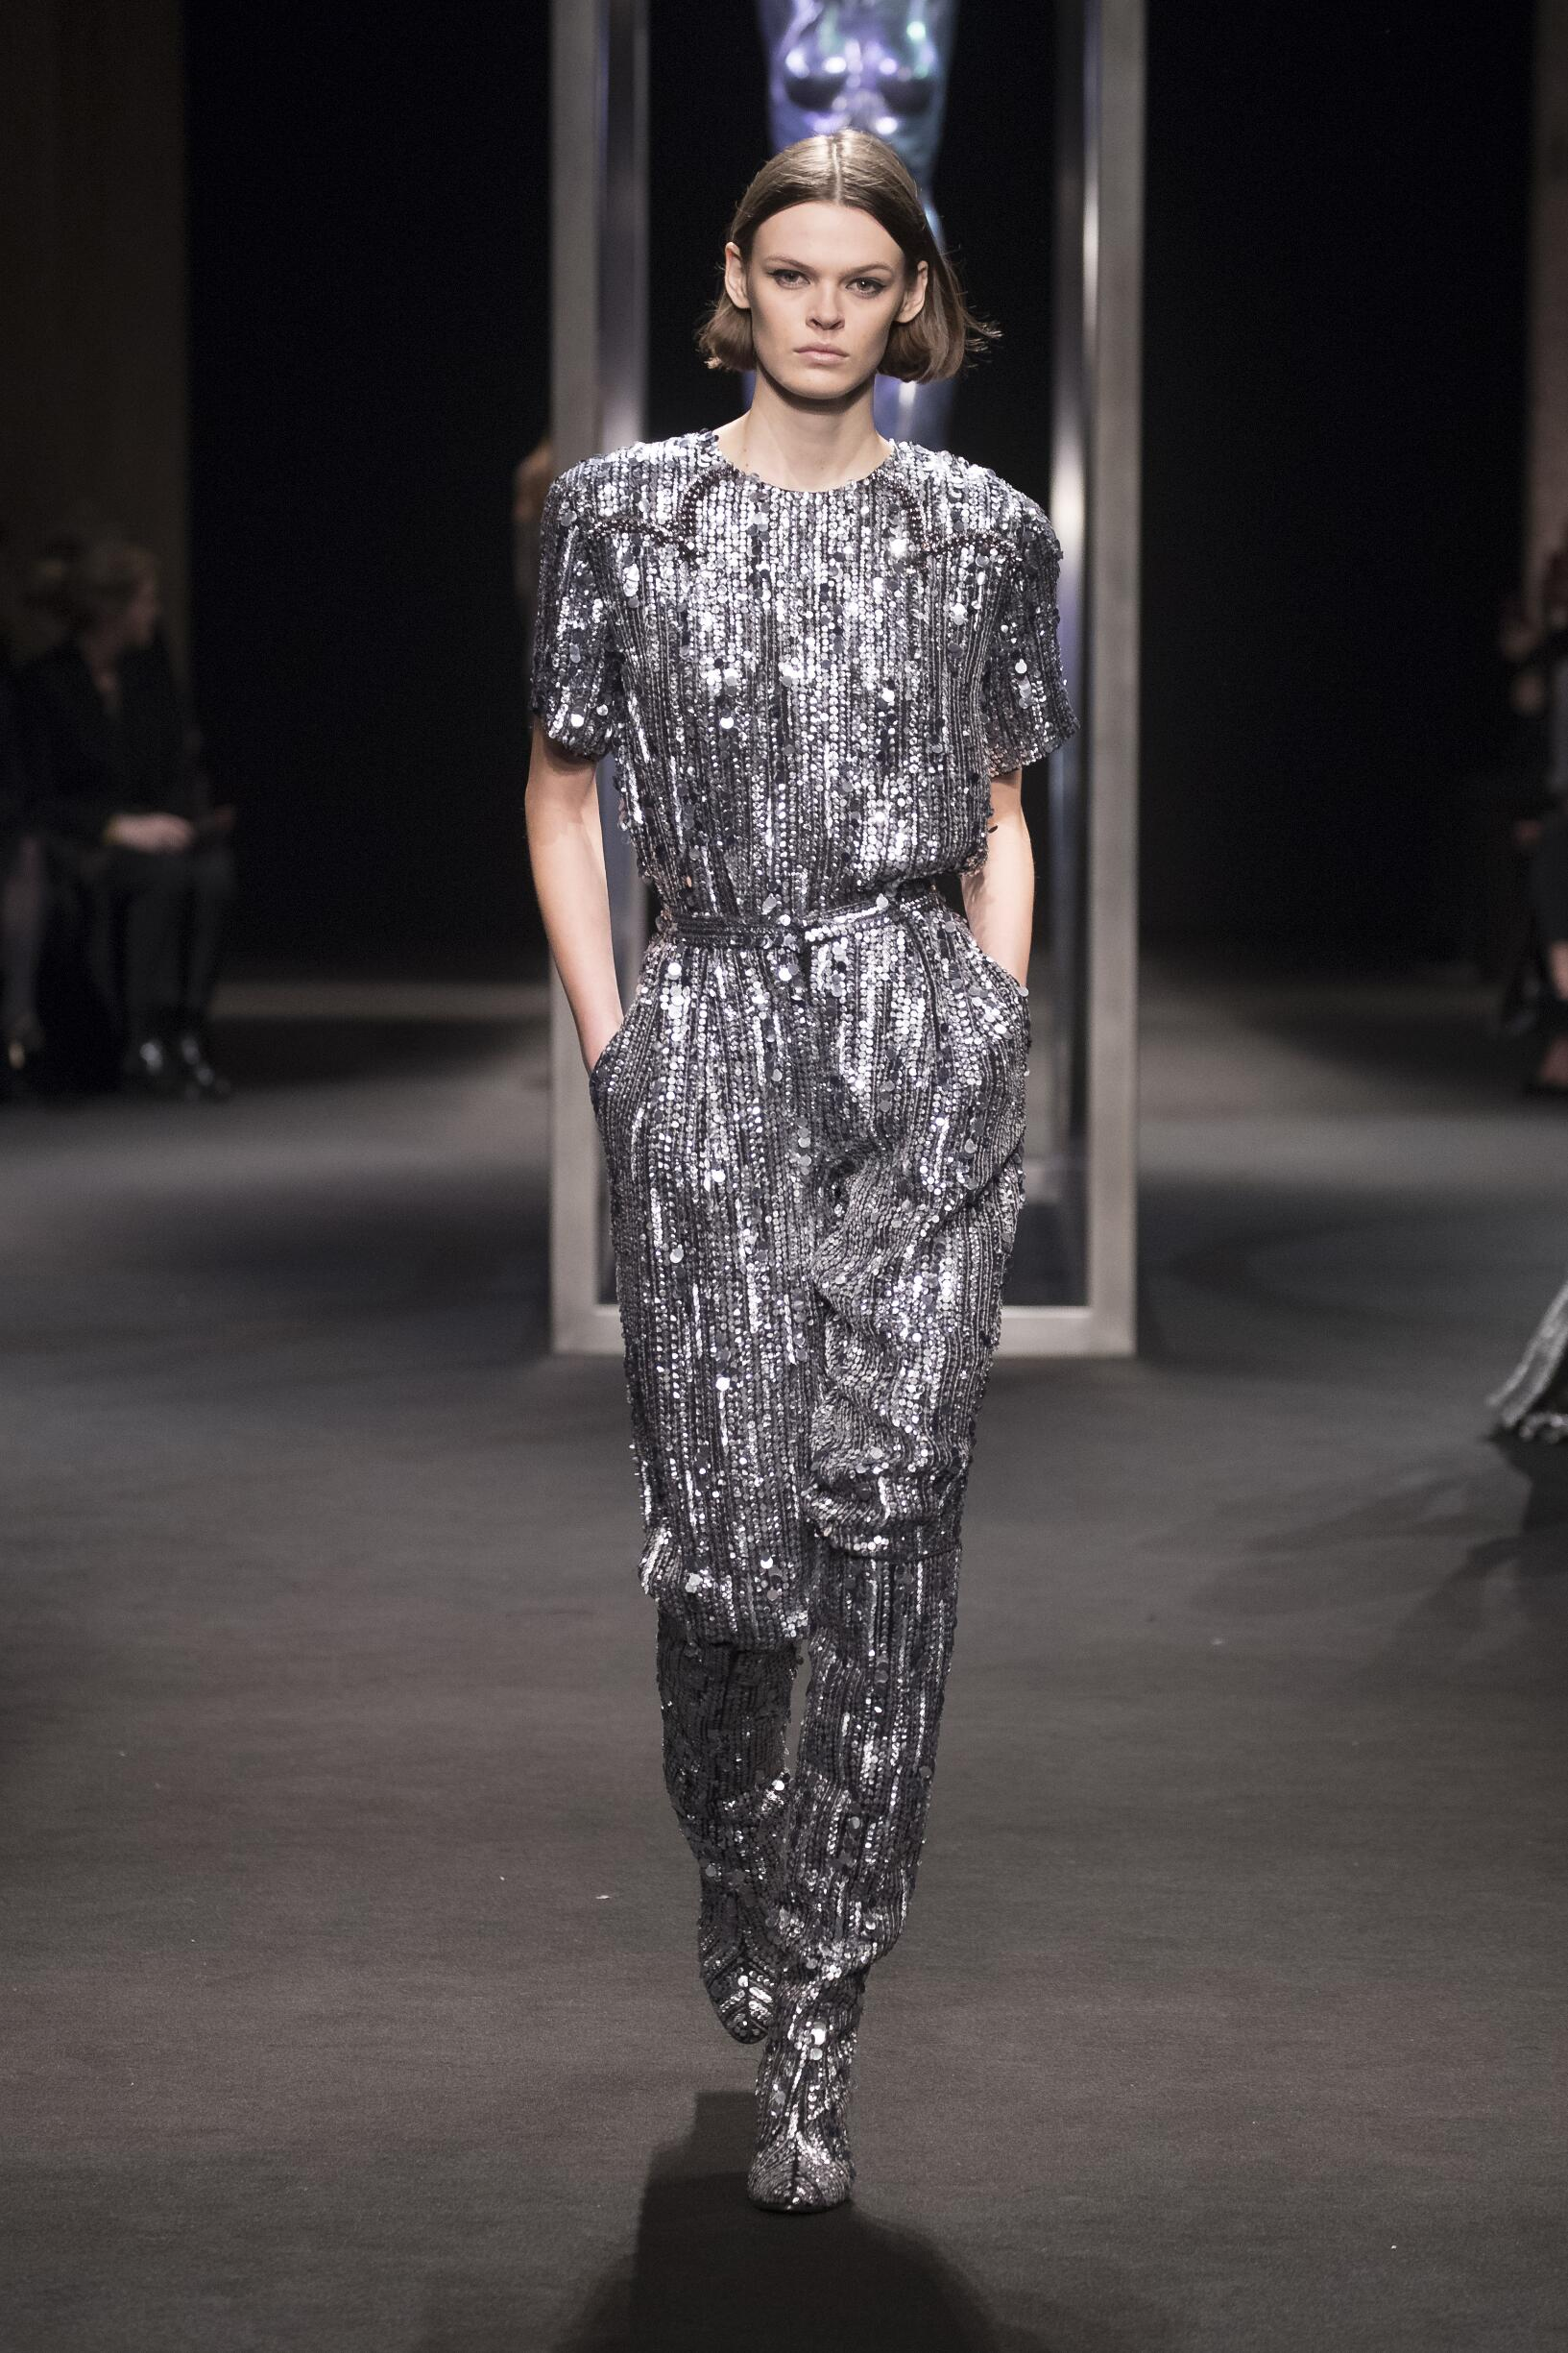 2018 Catwalk Alberta Ferretti Woman Fashion Show Winter